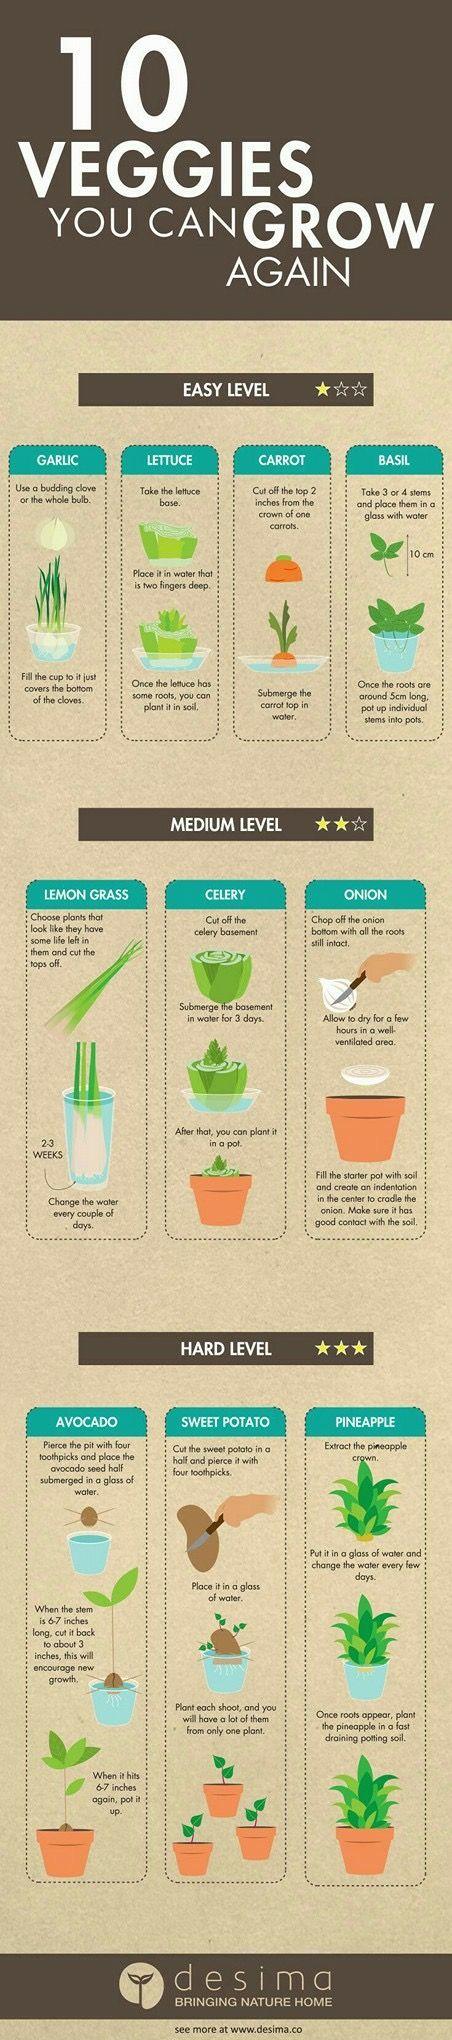 10 veggies you can grow again #avocado seed growing without toothpicks #Grow #Veggies